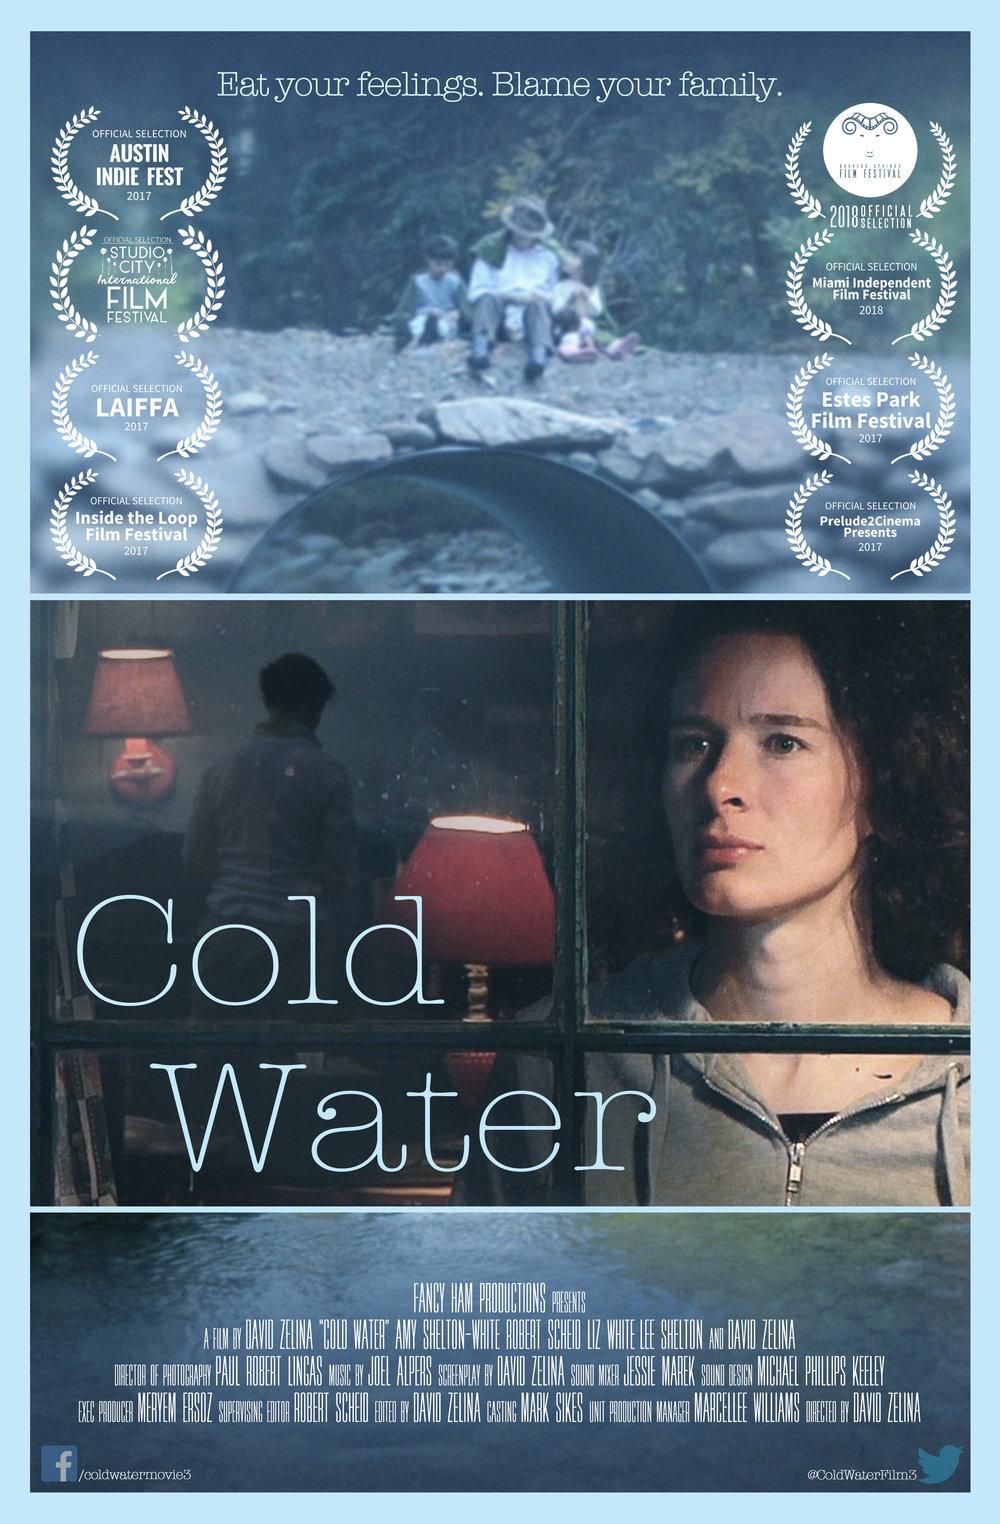 Cold Water Poster 2017 Laurels 08a.jpg